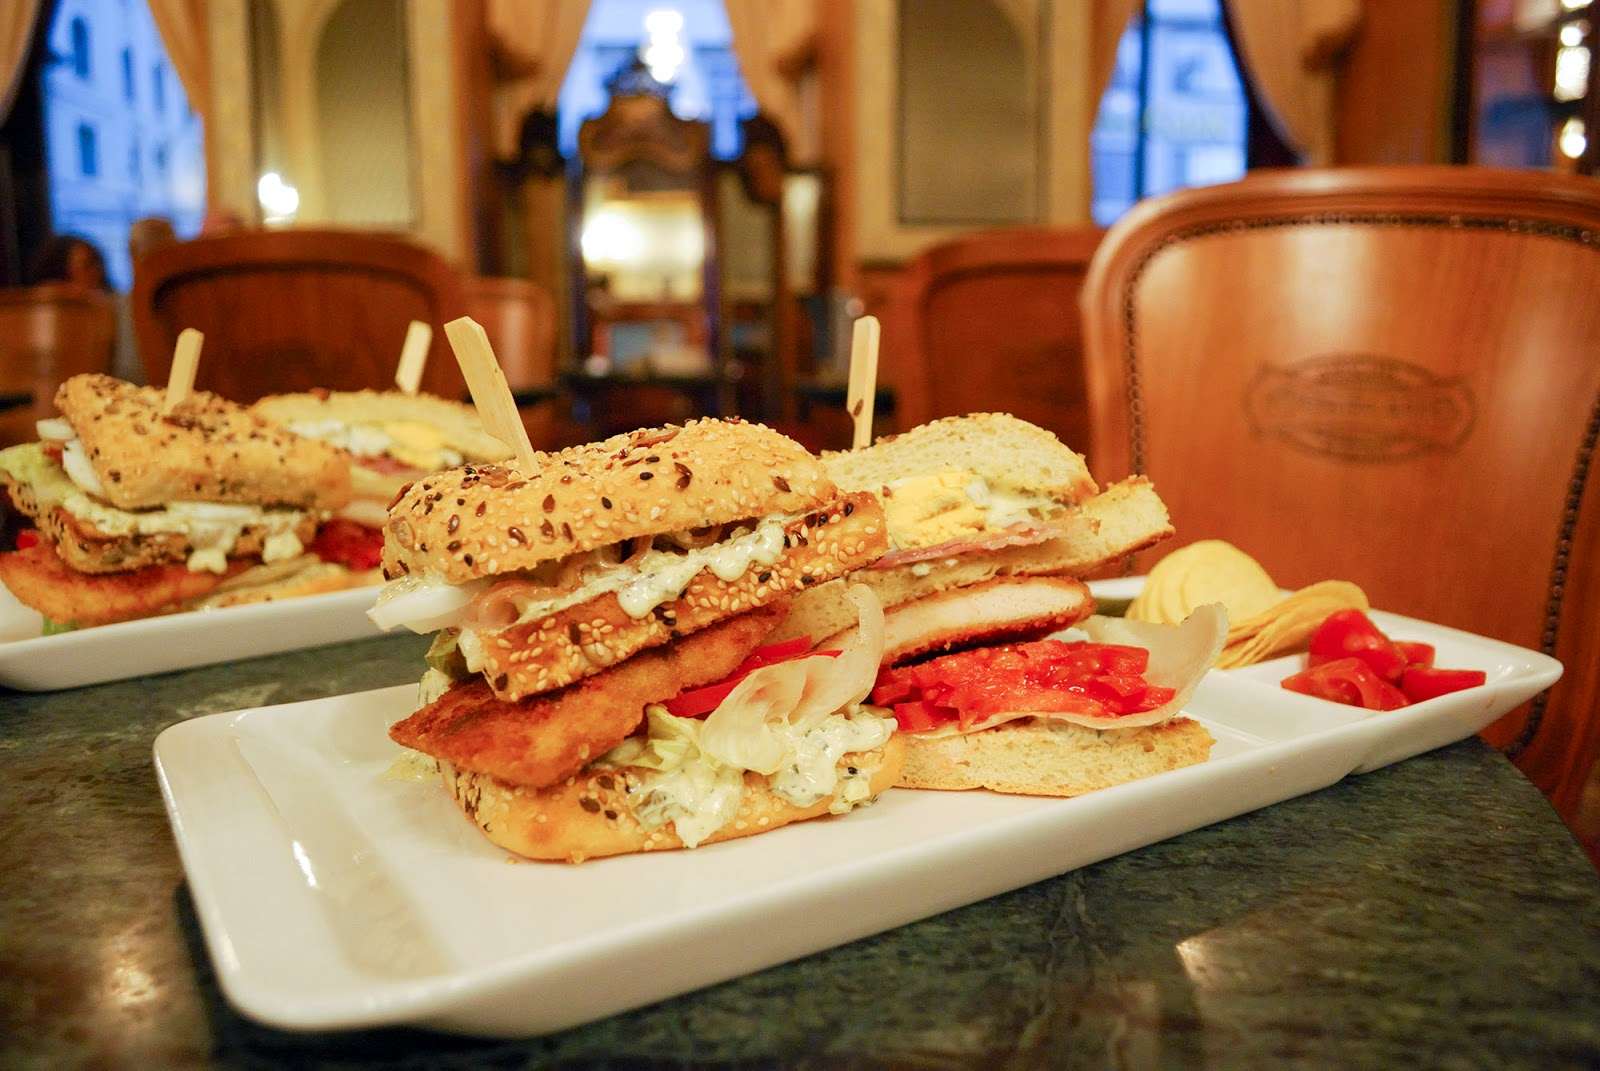 gerbaud cafe restaurant hotel high tea breakfast brunch hungary budapest